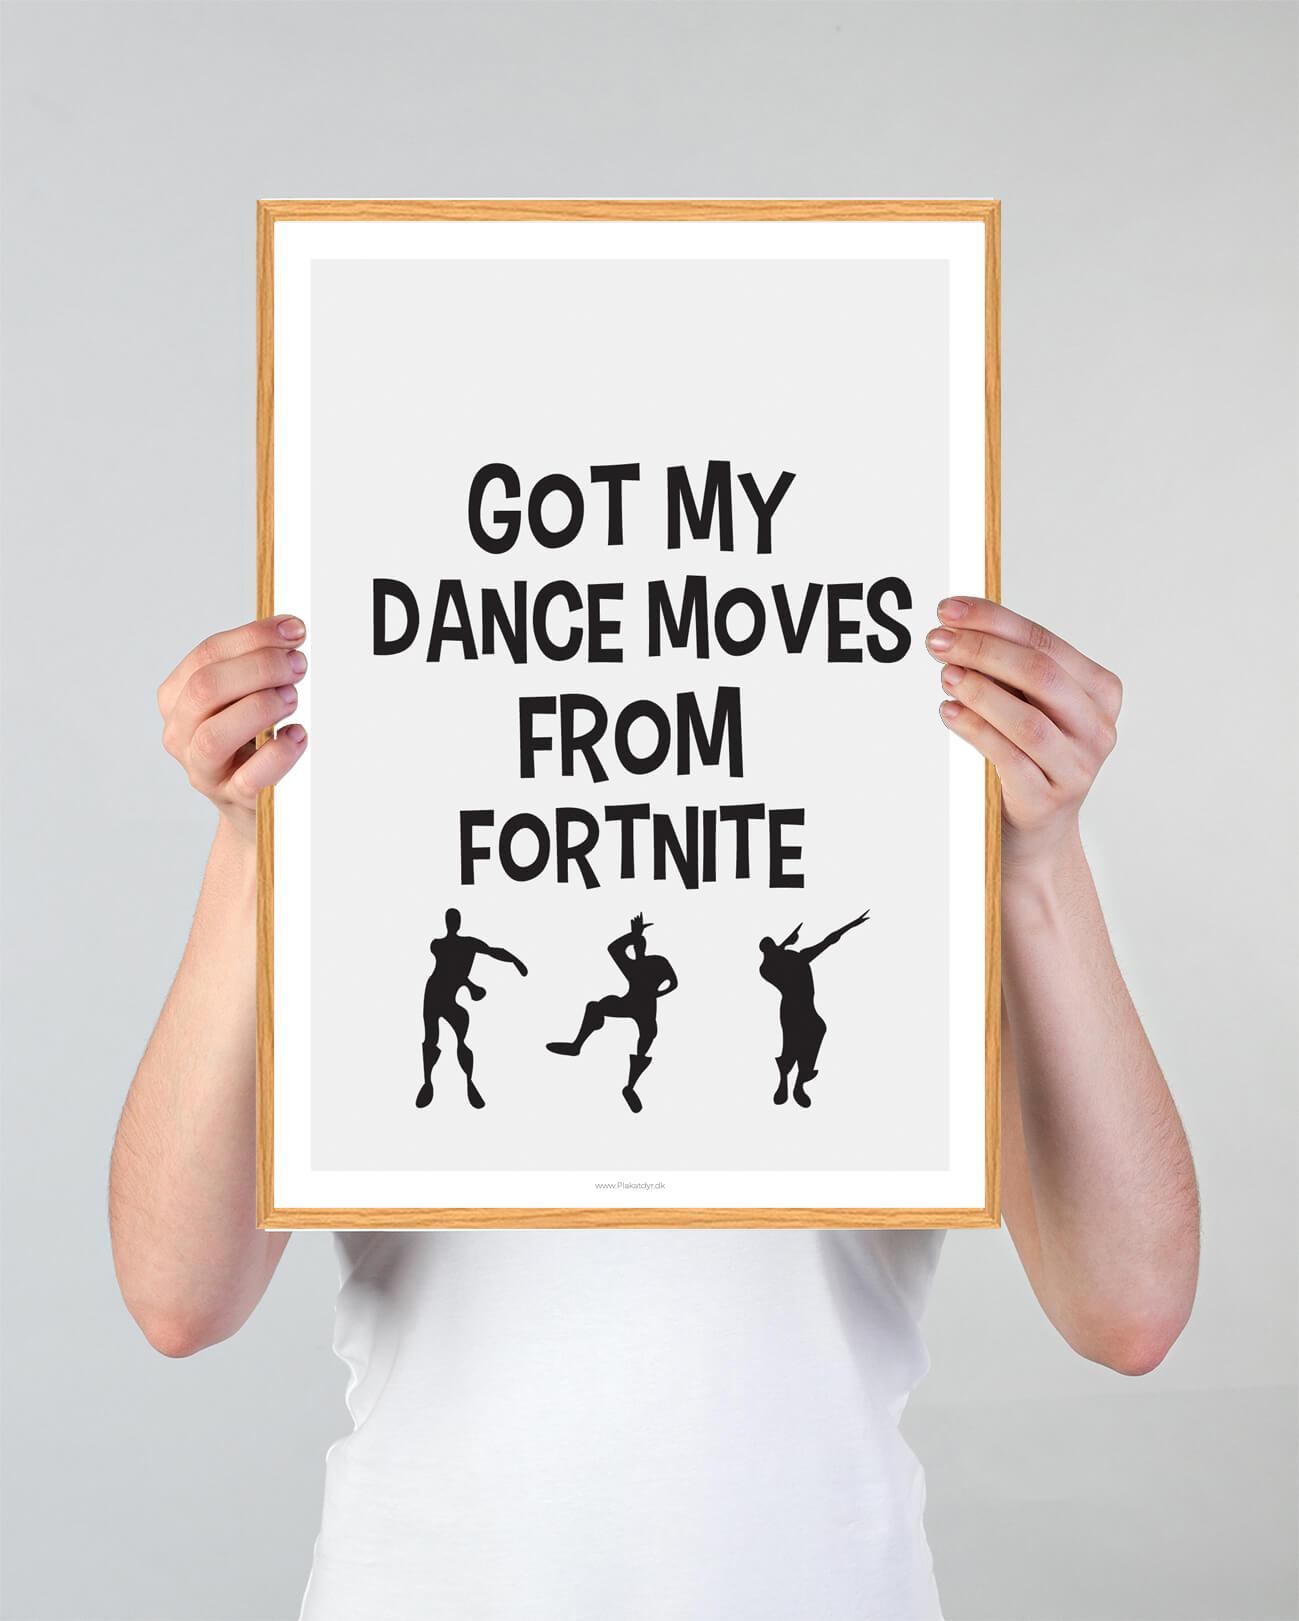 Fortnite-dances-moves-3